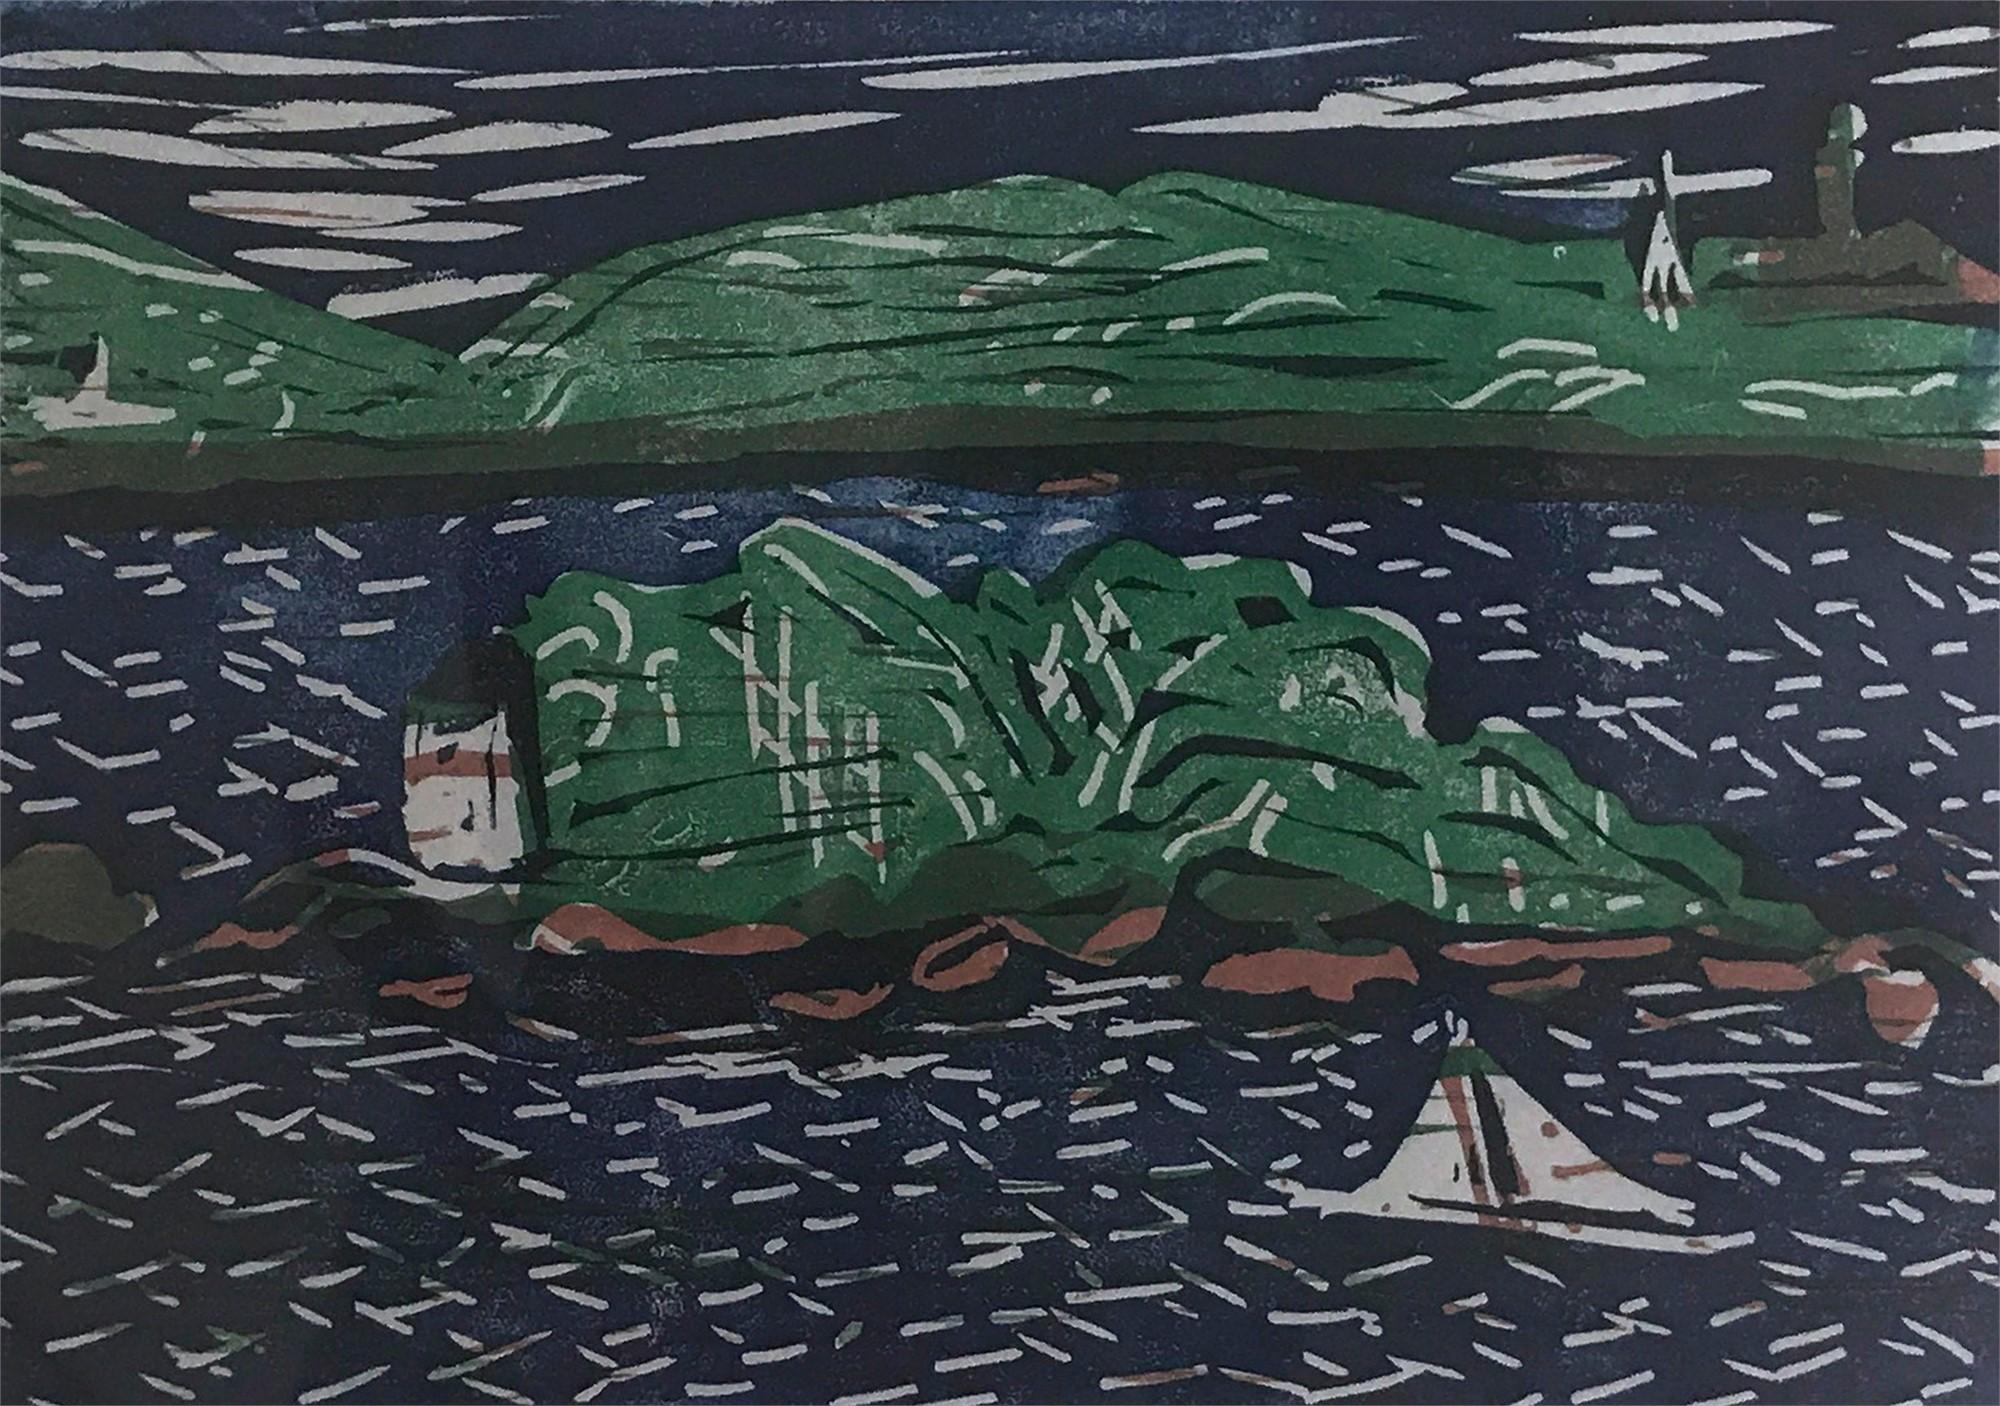 Sailing Past 10 Pound Island (3/5), 2019